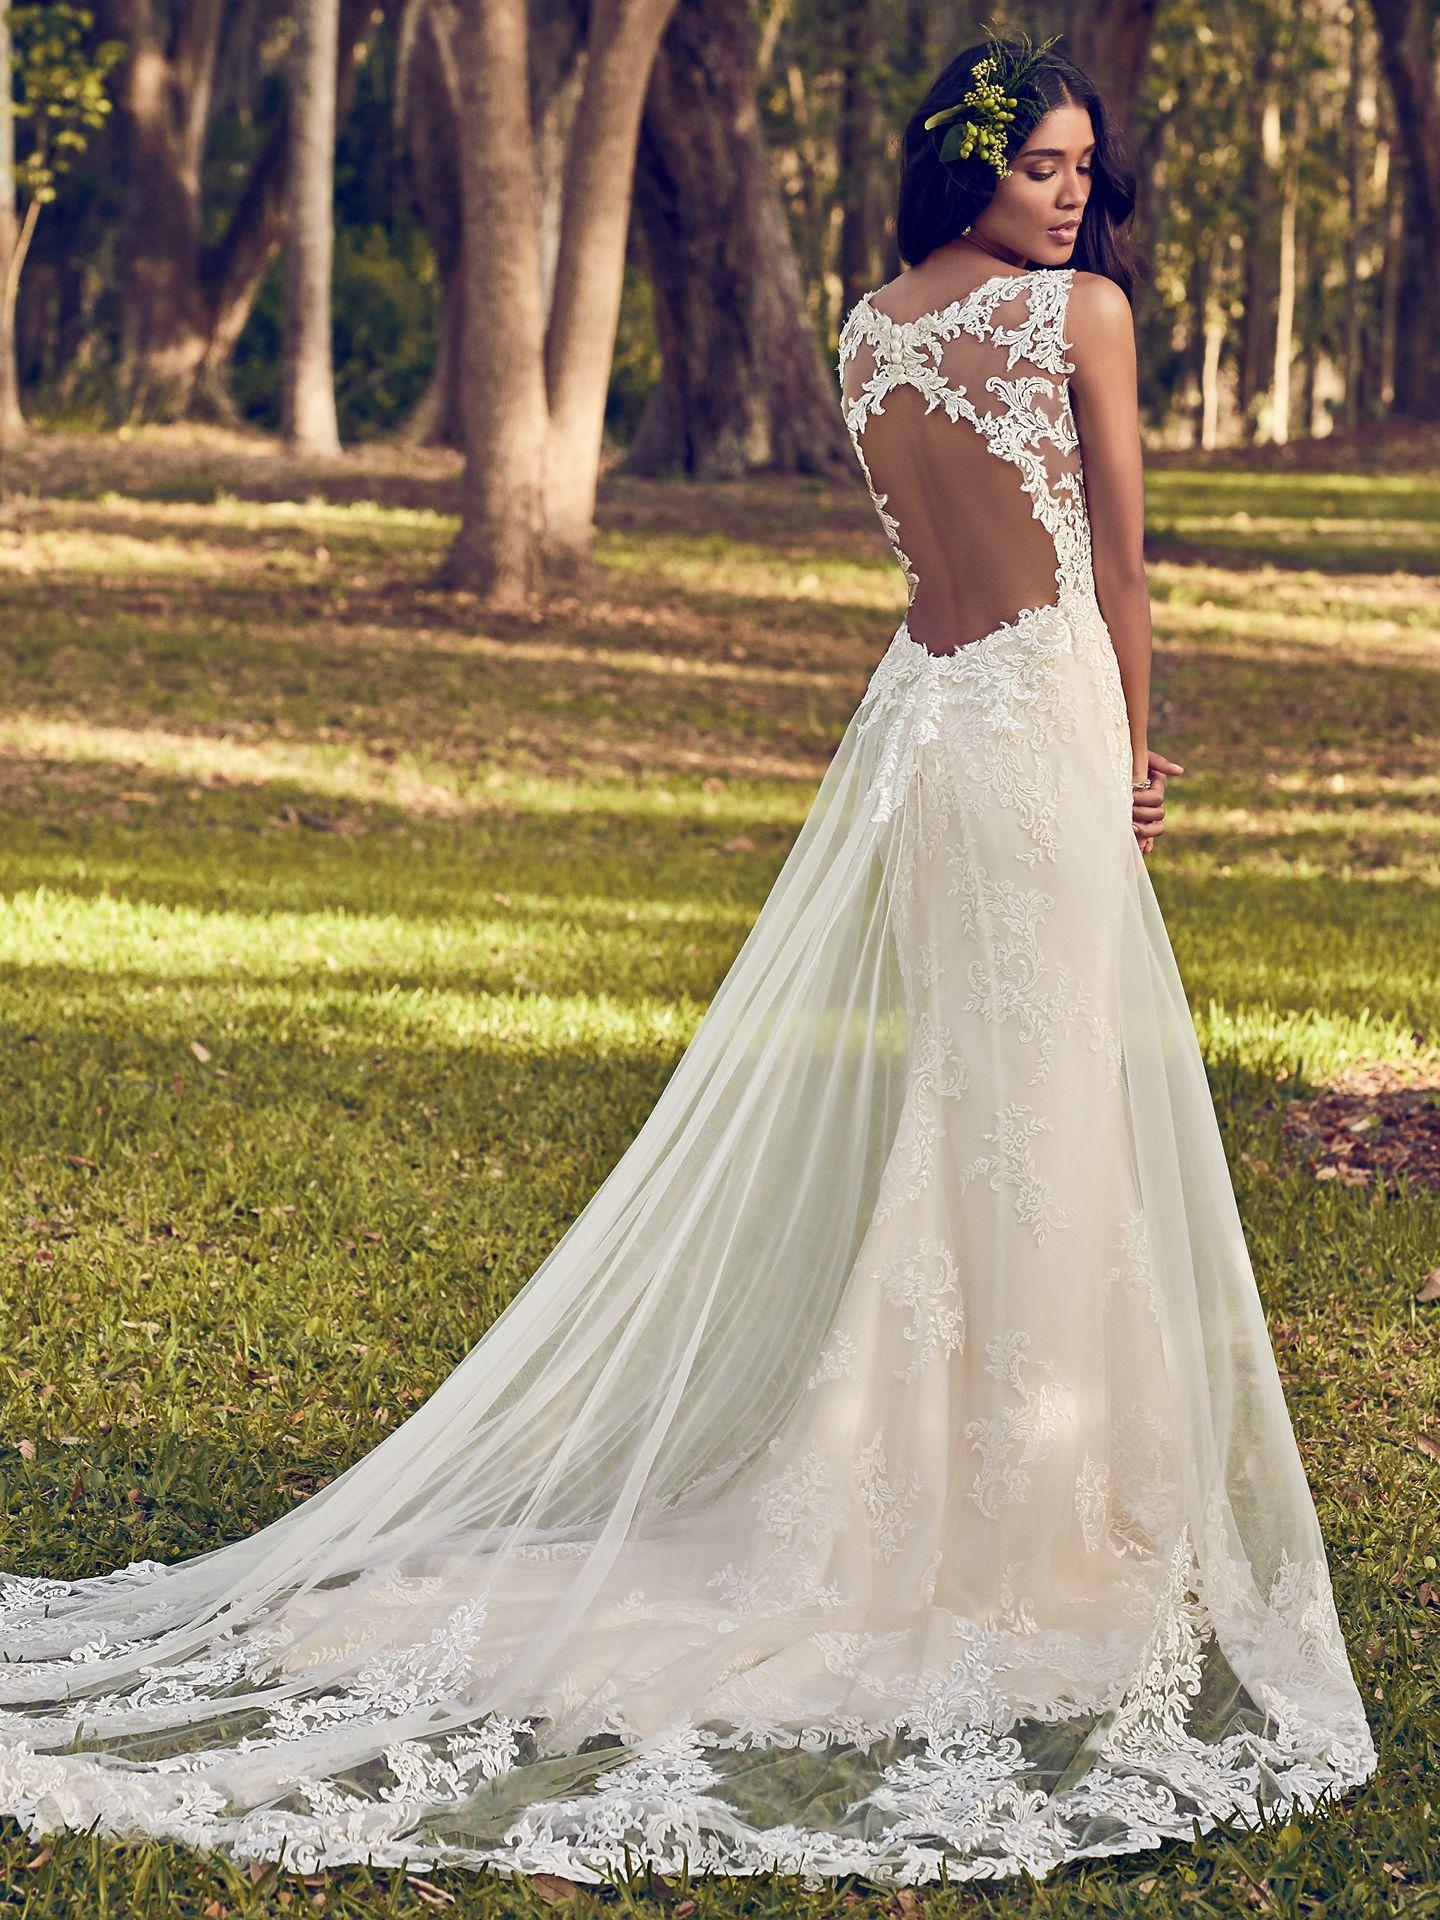 Maggie Sottero Wedding Dress Bernadine 8MN499 MainBack